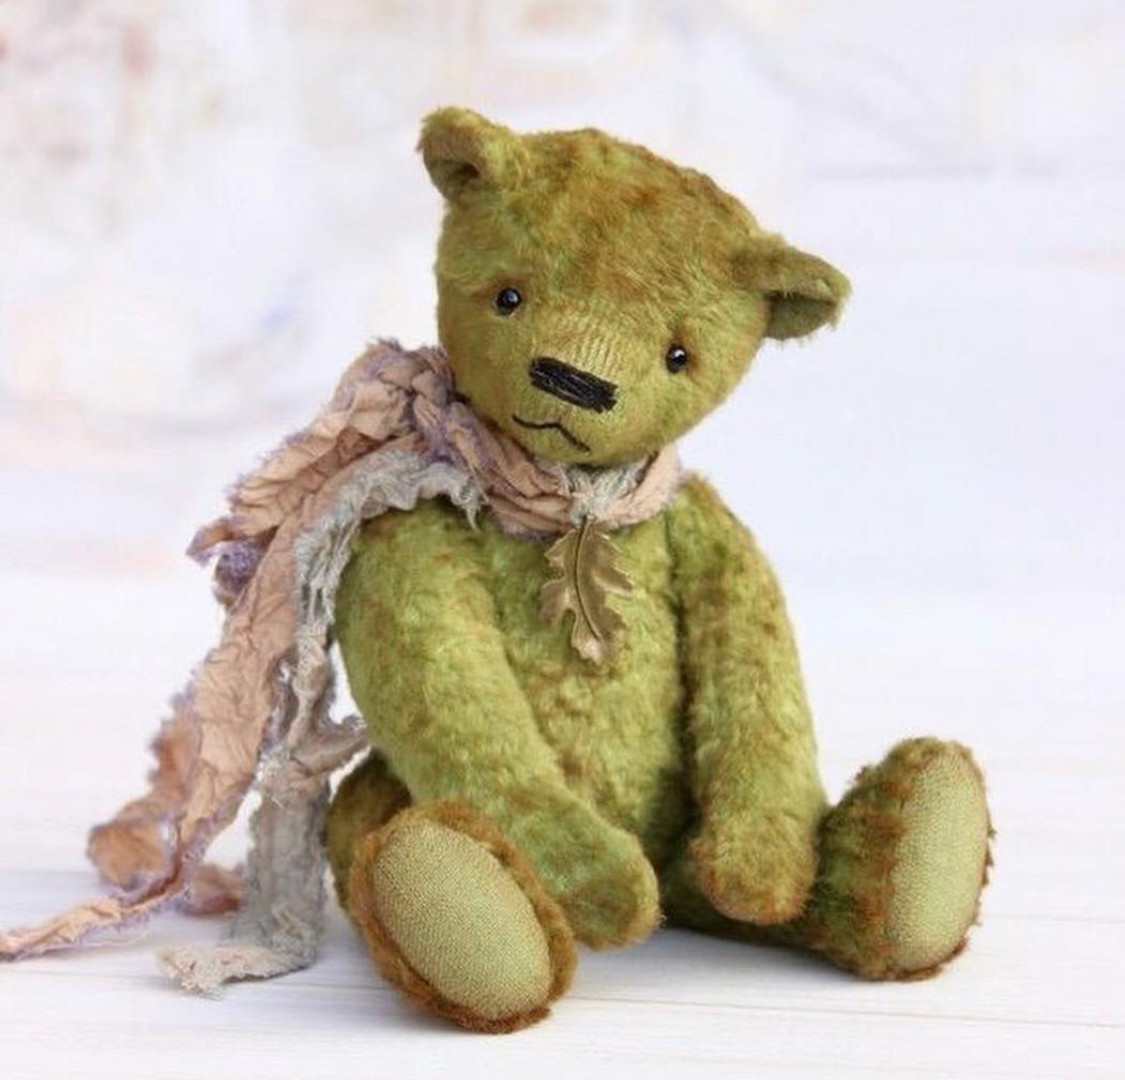 By: Vytvorjushka Teddybears